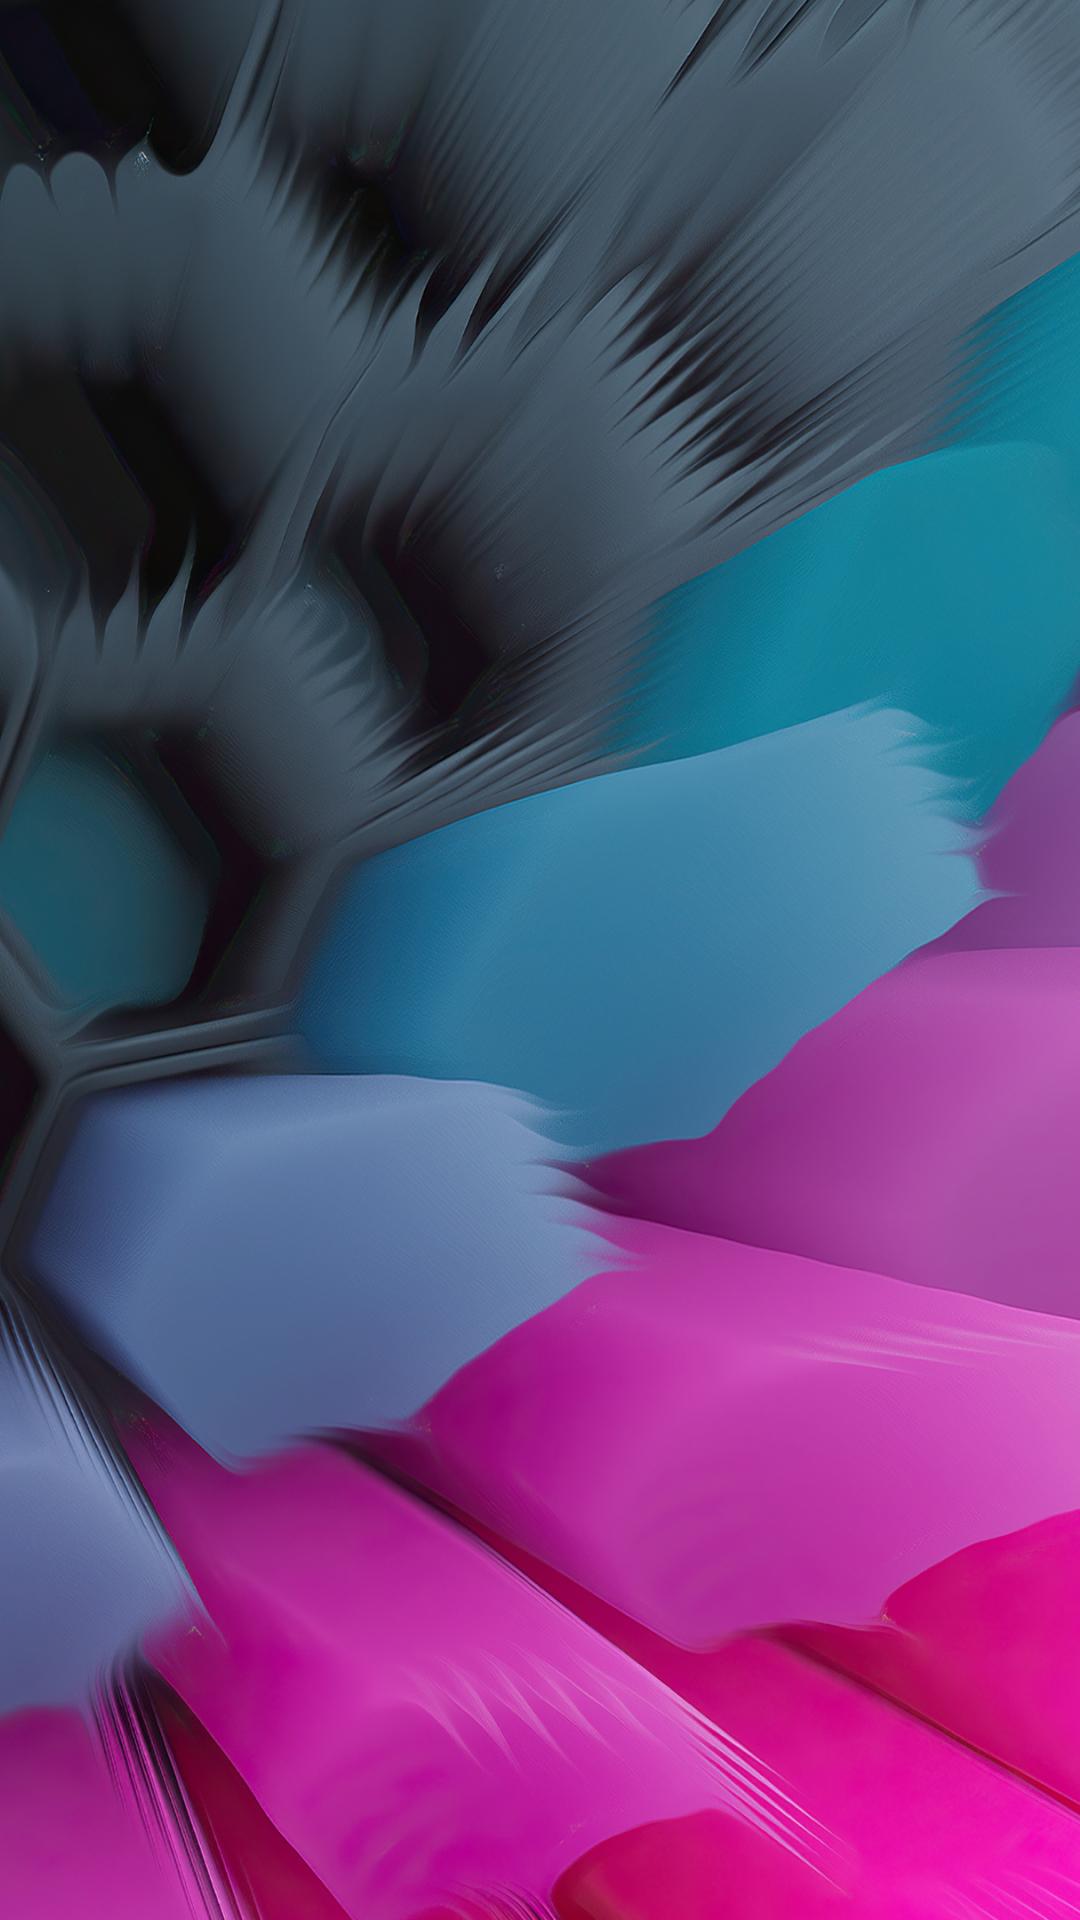 Pink Blue 4K Hexagon Wallpaper in 1080x1920 Resolution